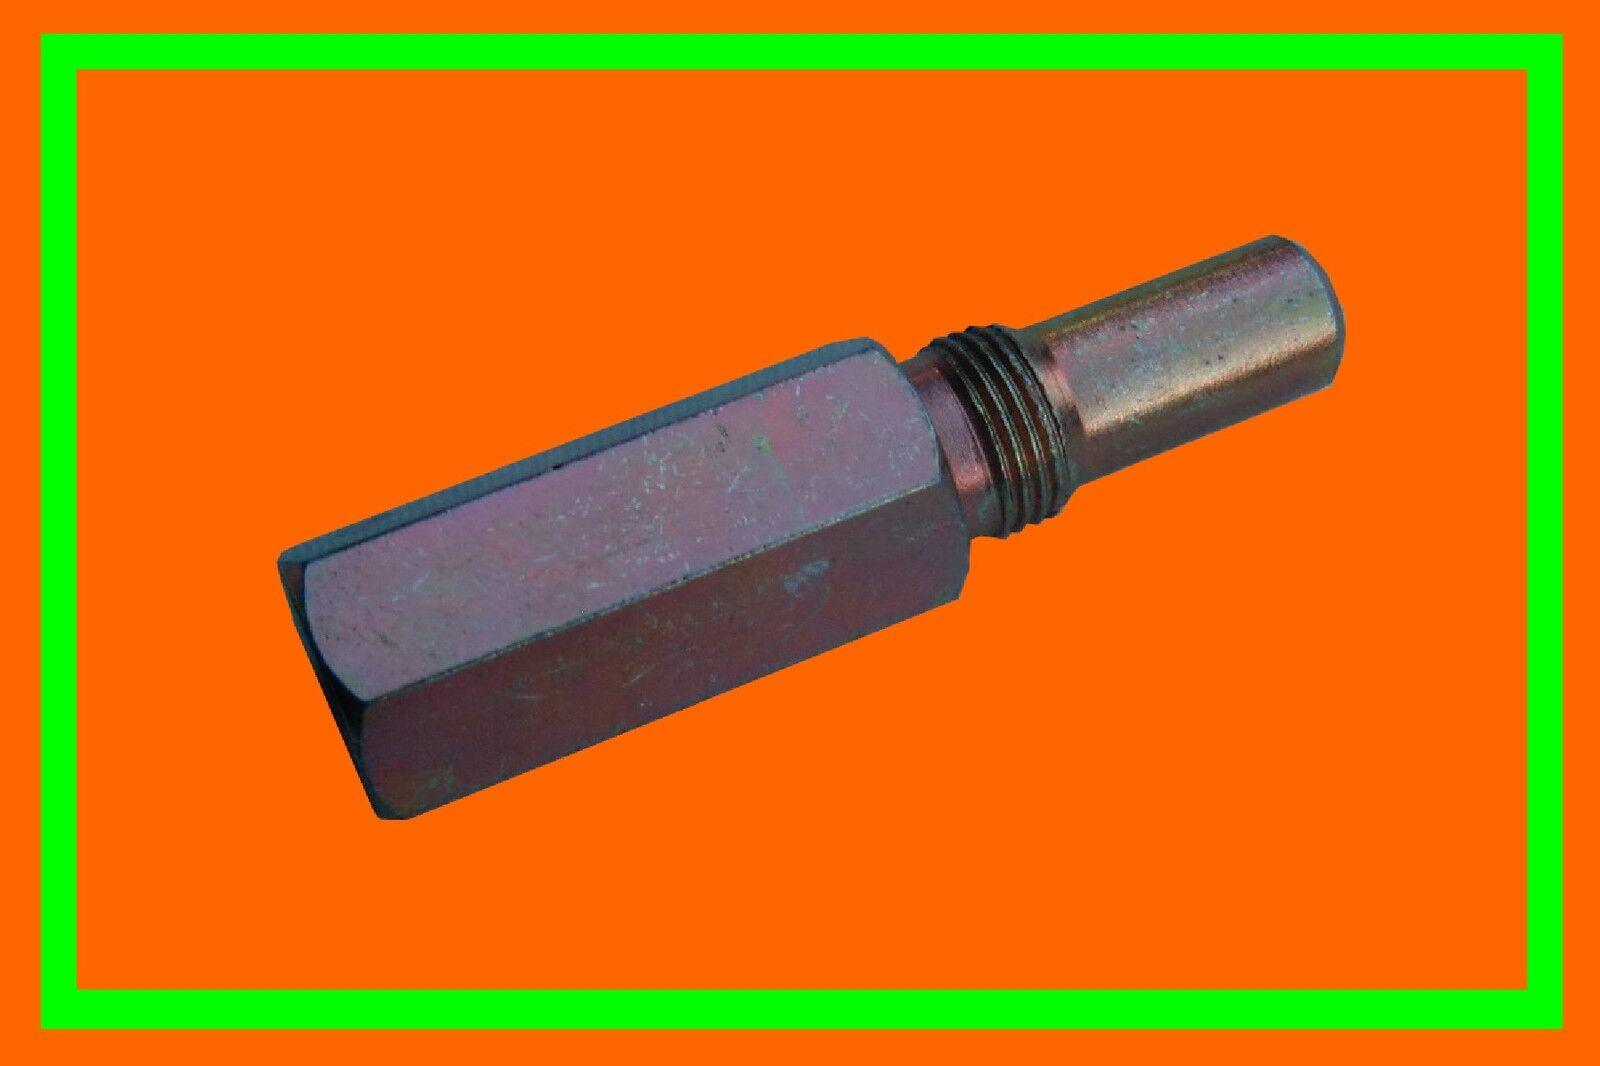 2x  Wellendichtring Stihl MS660 MS661 Simmerring Motorsäge Wellendichtringe 660